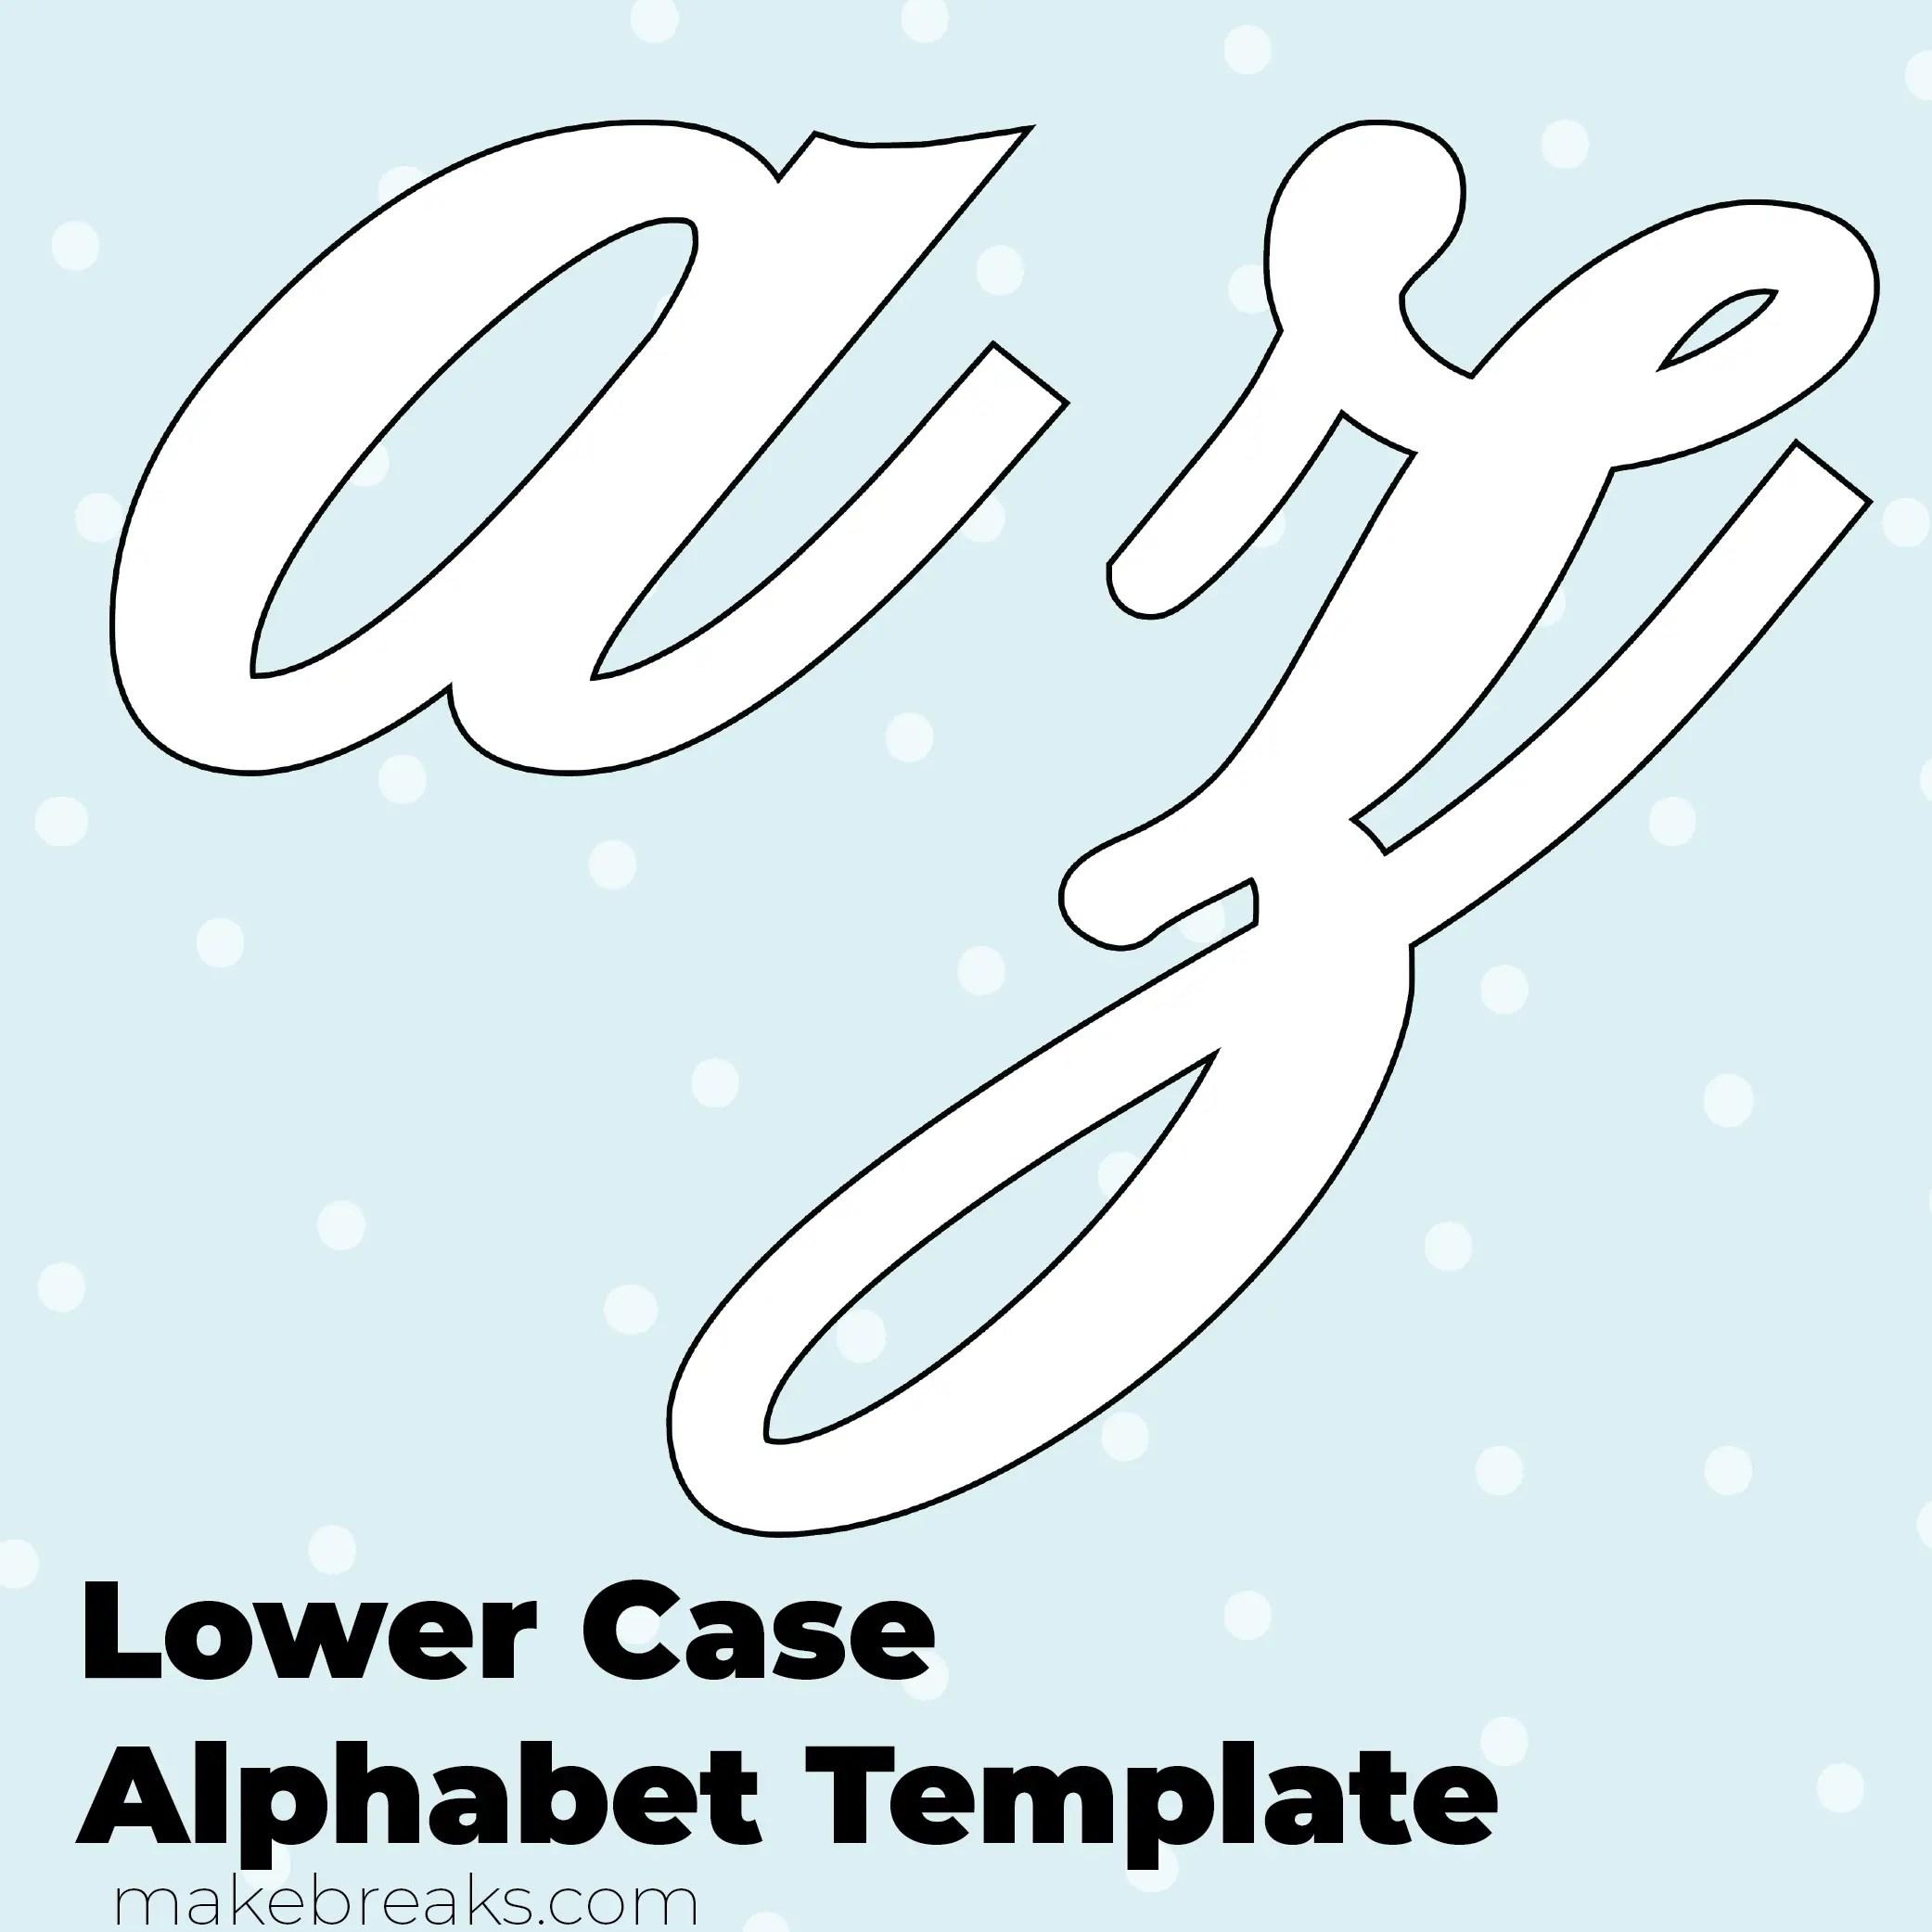 photograph regarding Printable Alphabet Templates identified as Cost-free Printable Script Letter Alphabet Template - Reduced Scenario